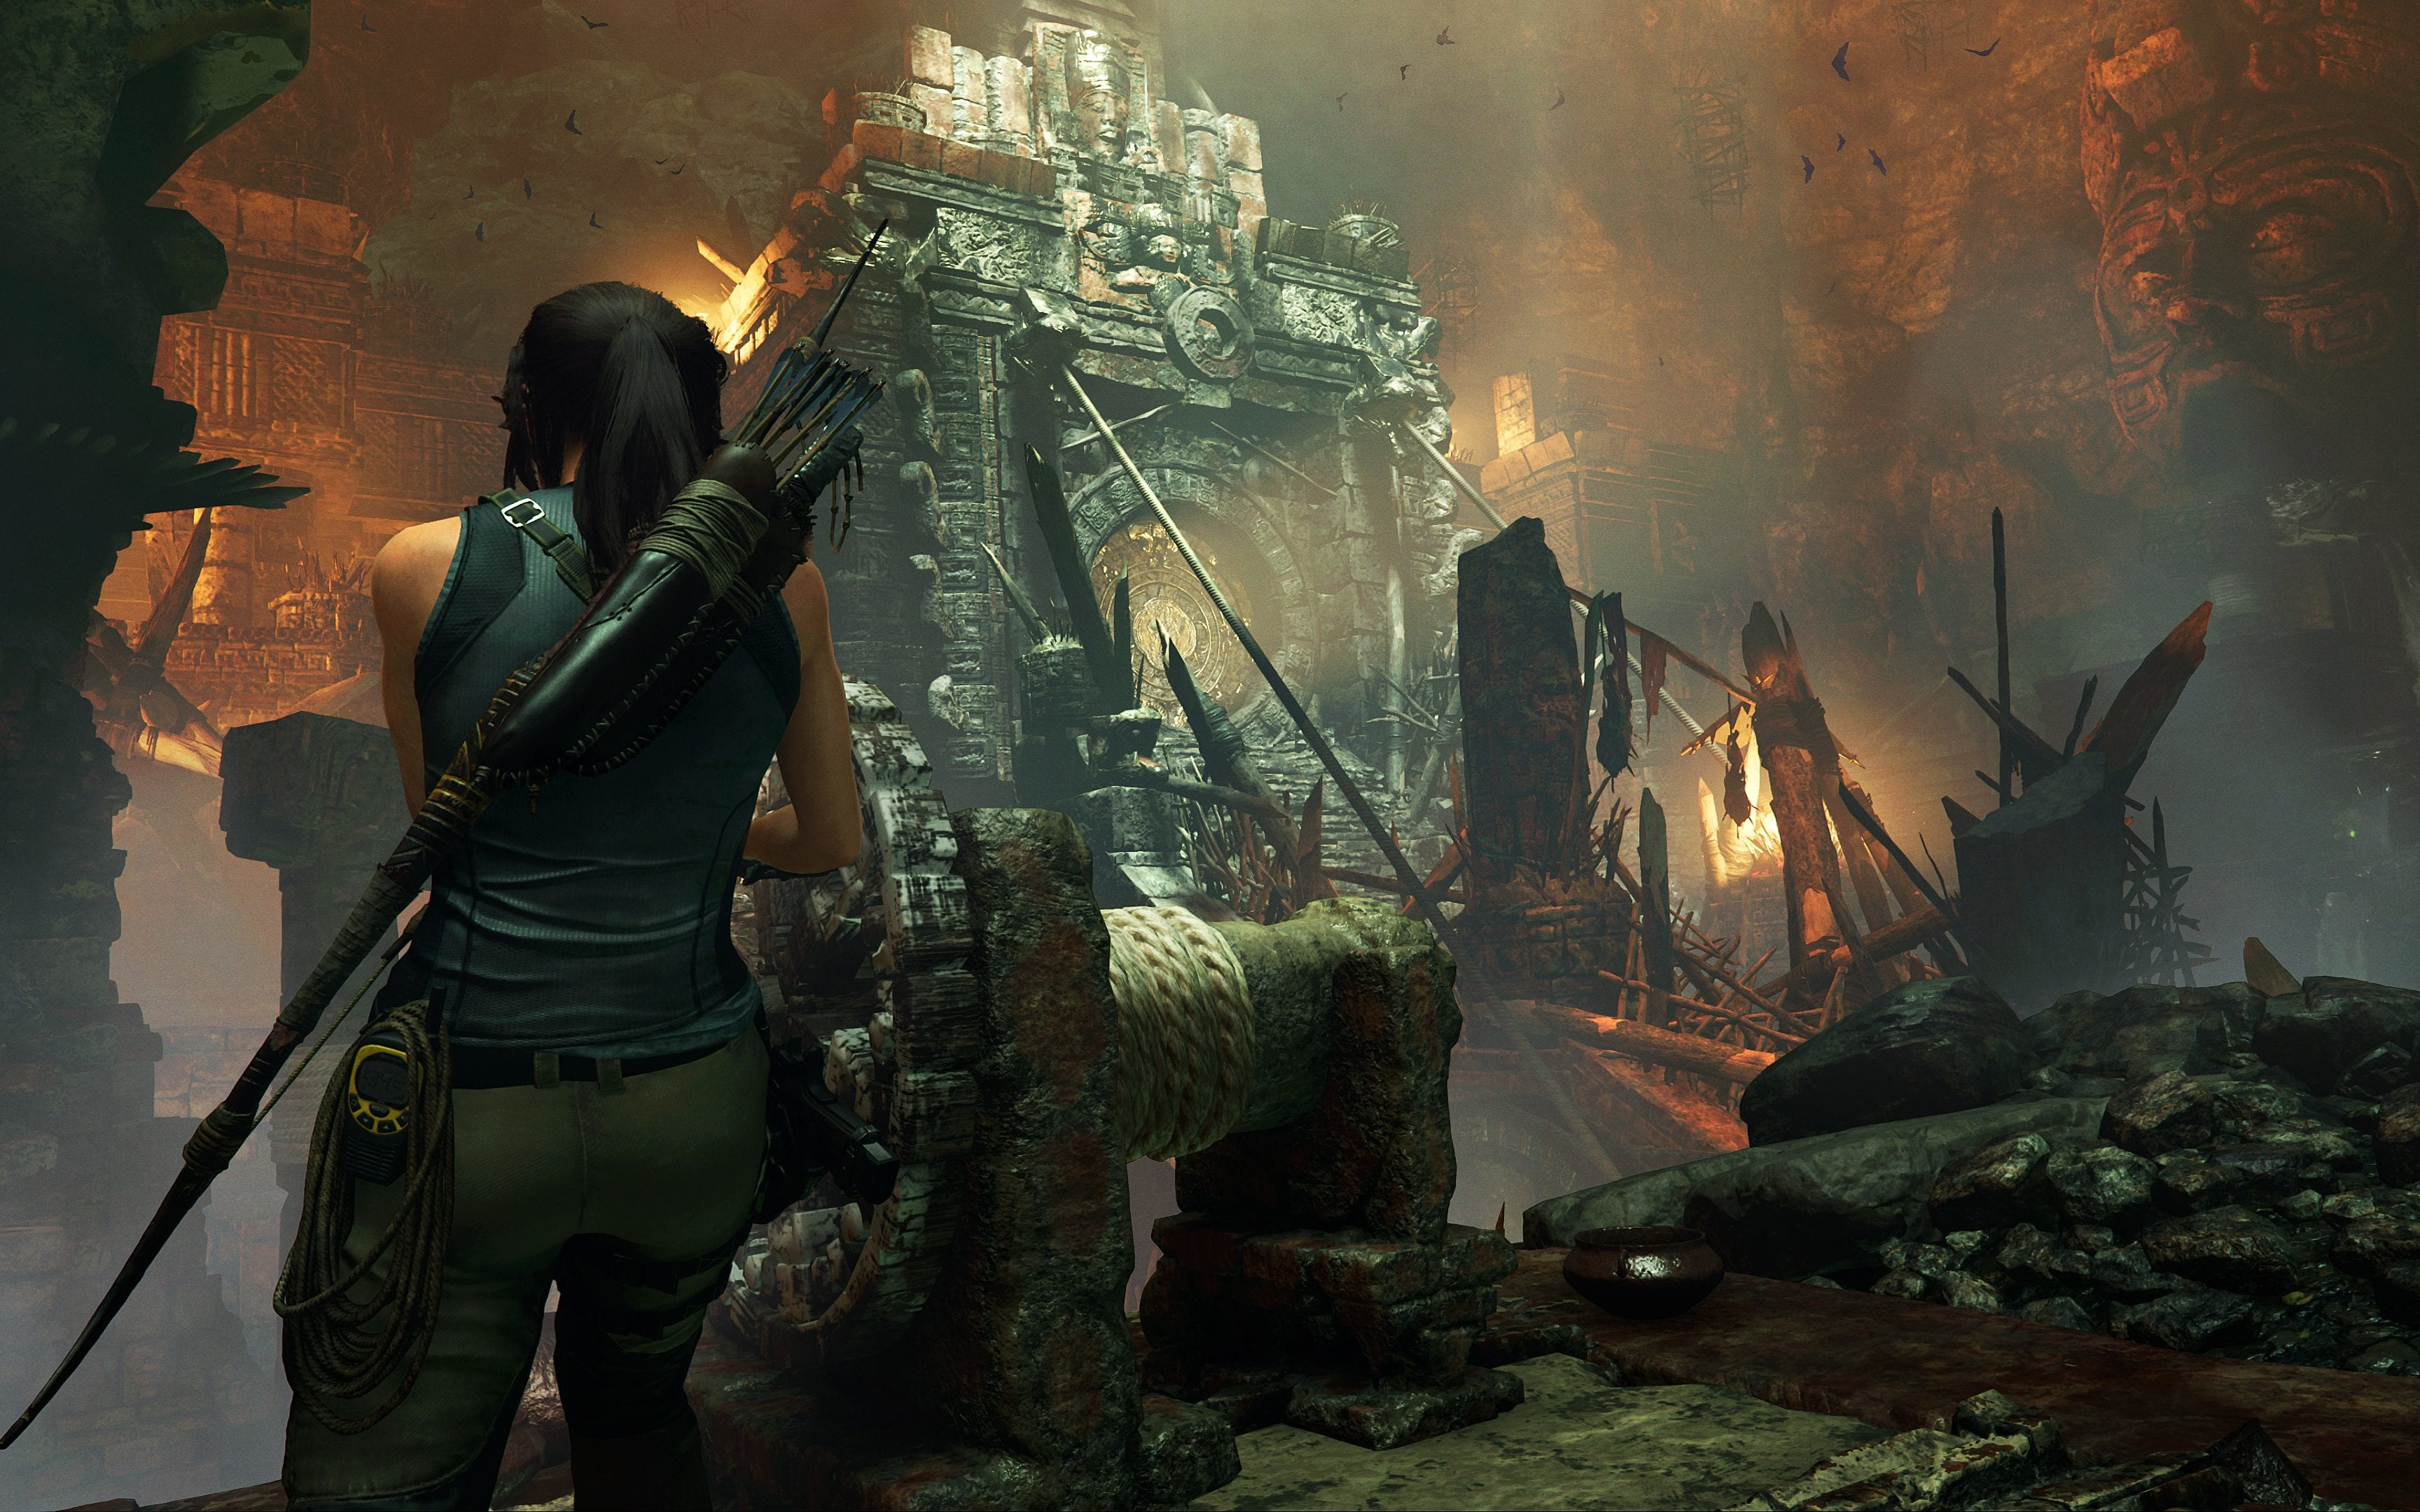 shadow of the tomb raider ile ilgili görsel sonucu